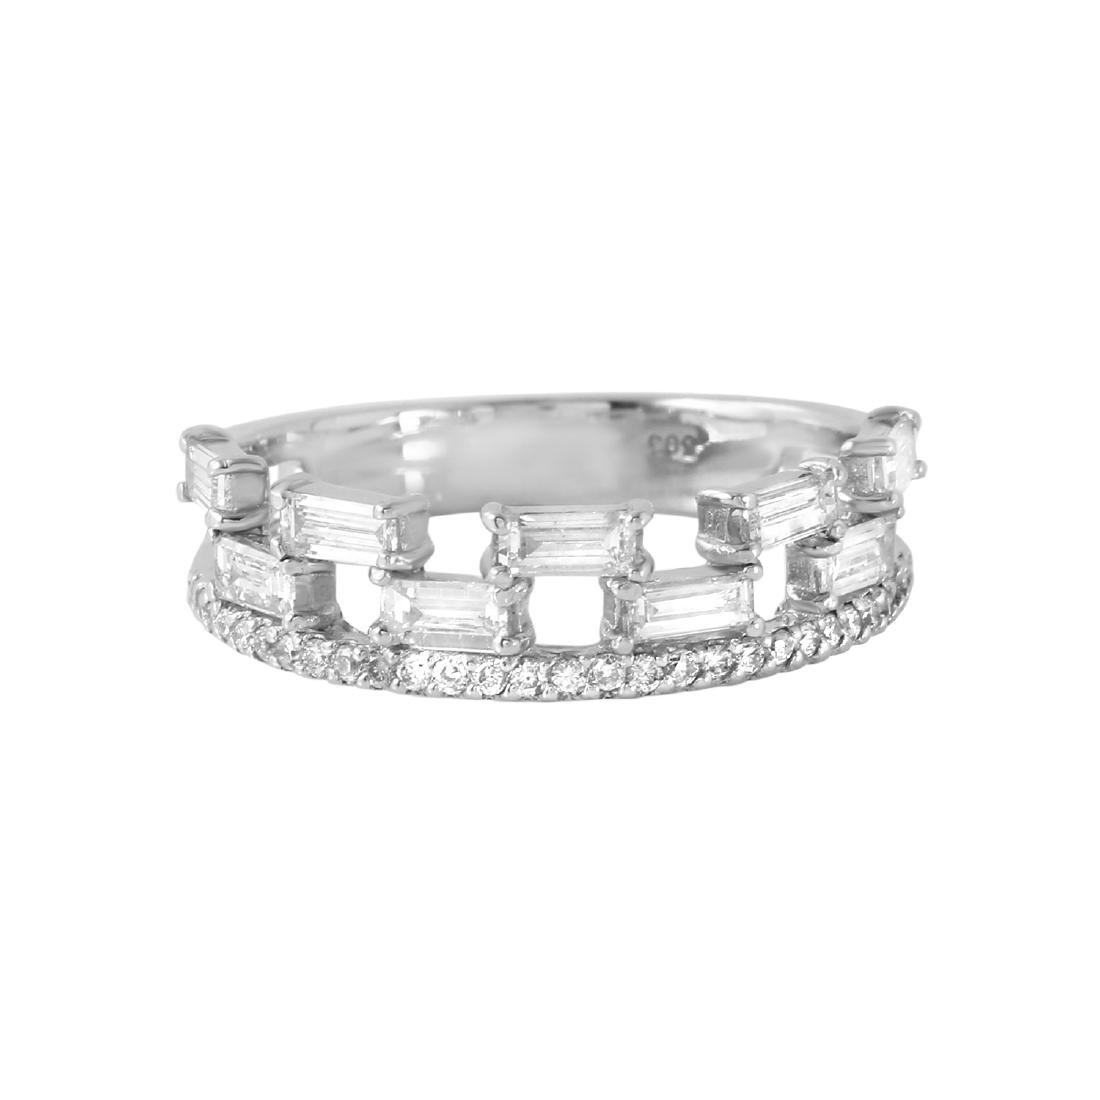 0.80 Carat Natural Diamond 18K Solid White Gold Ring - 2